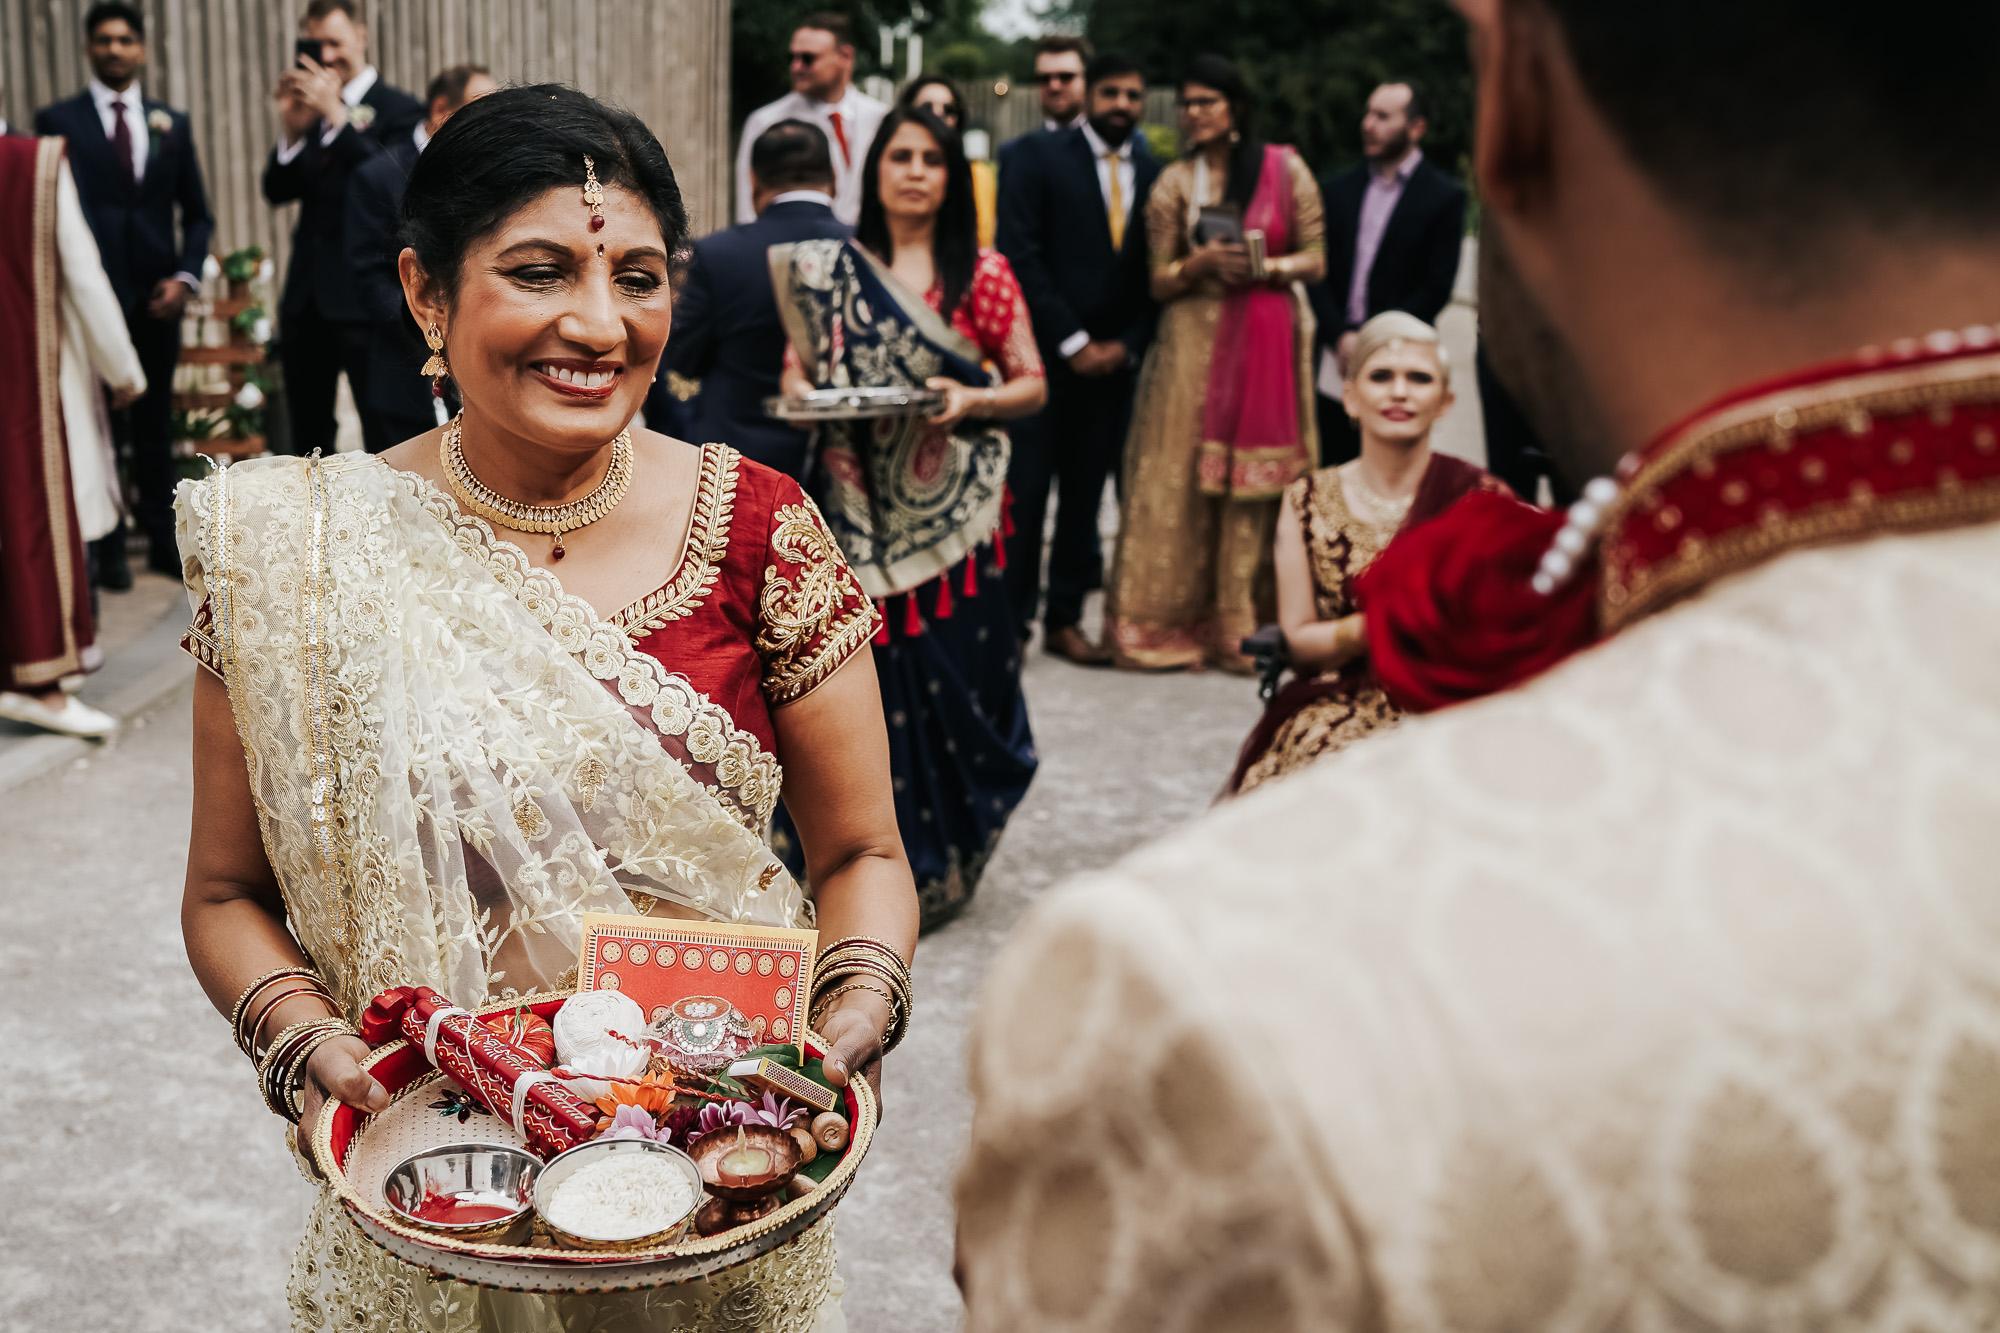 Alcumlow Hall Farm Indian Wedding Photographer (1 of 4).jpg